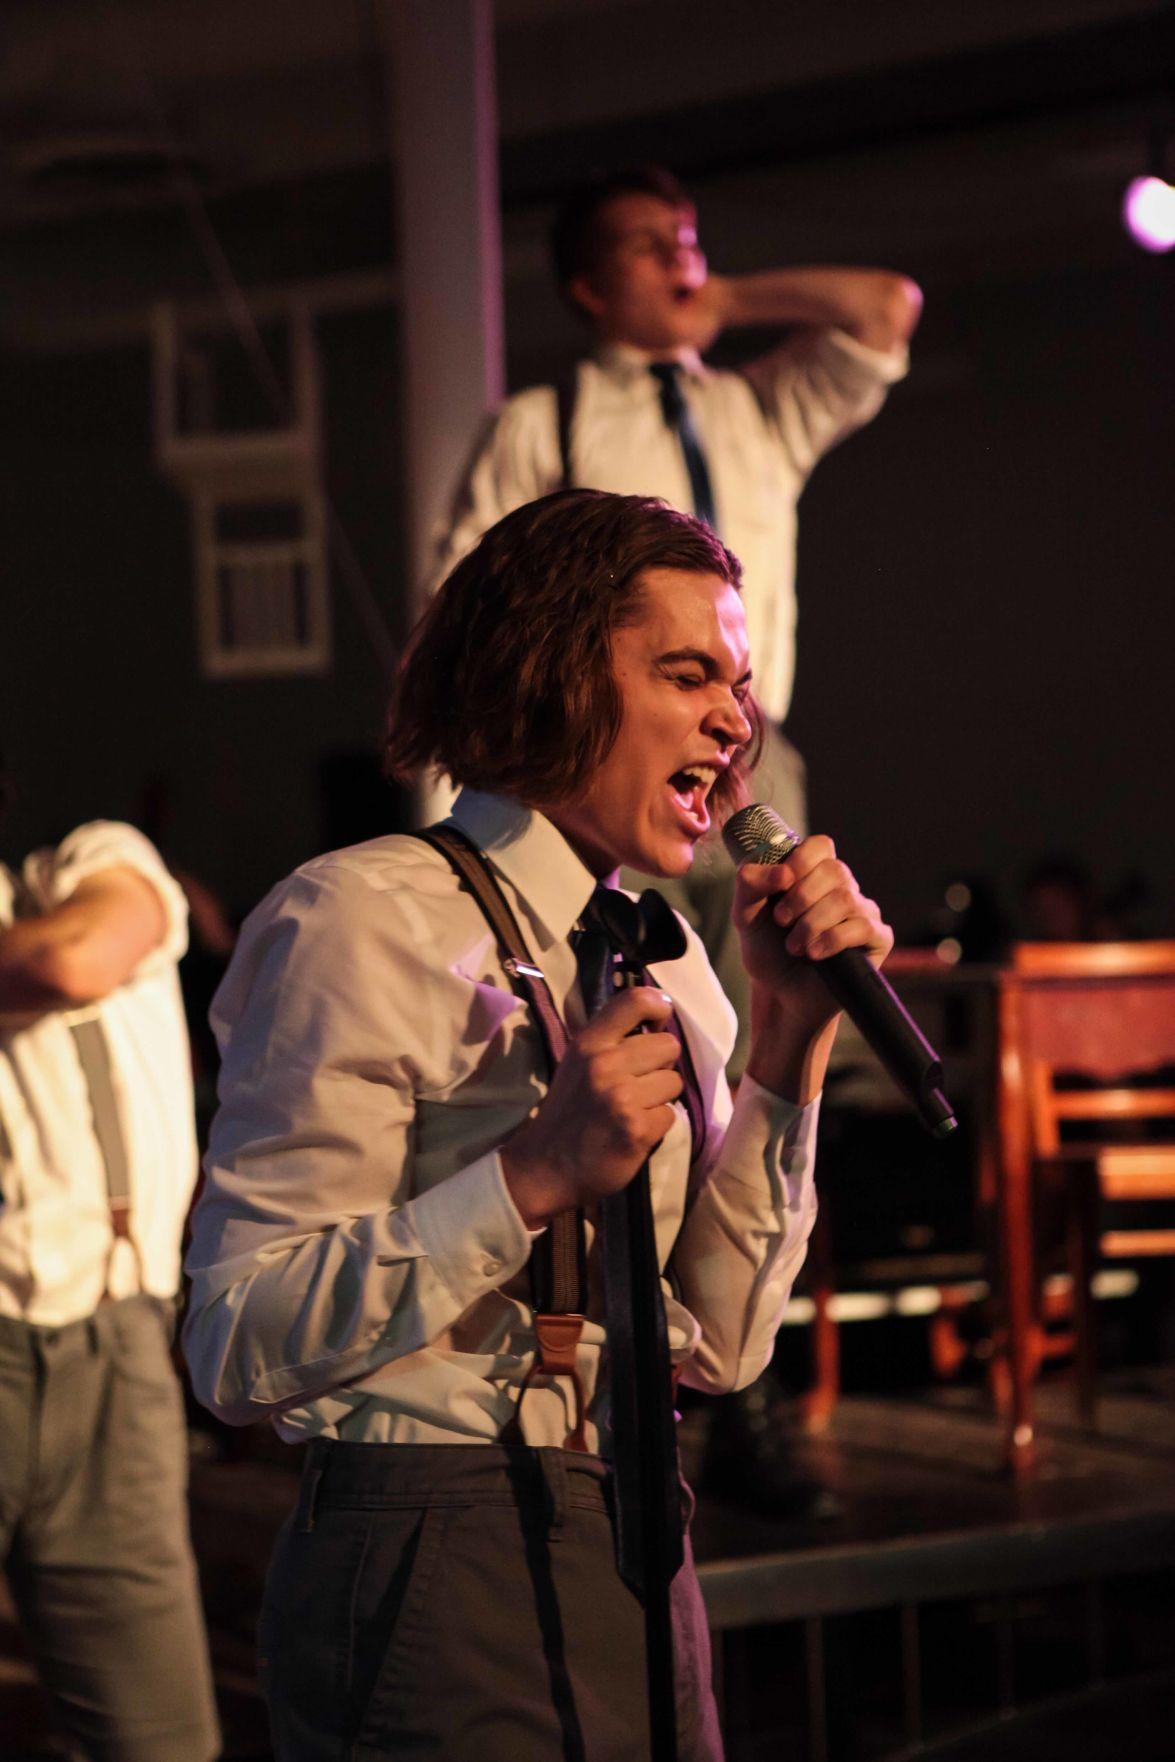 Performing Institute of Minnesota - Singer